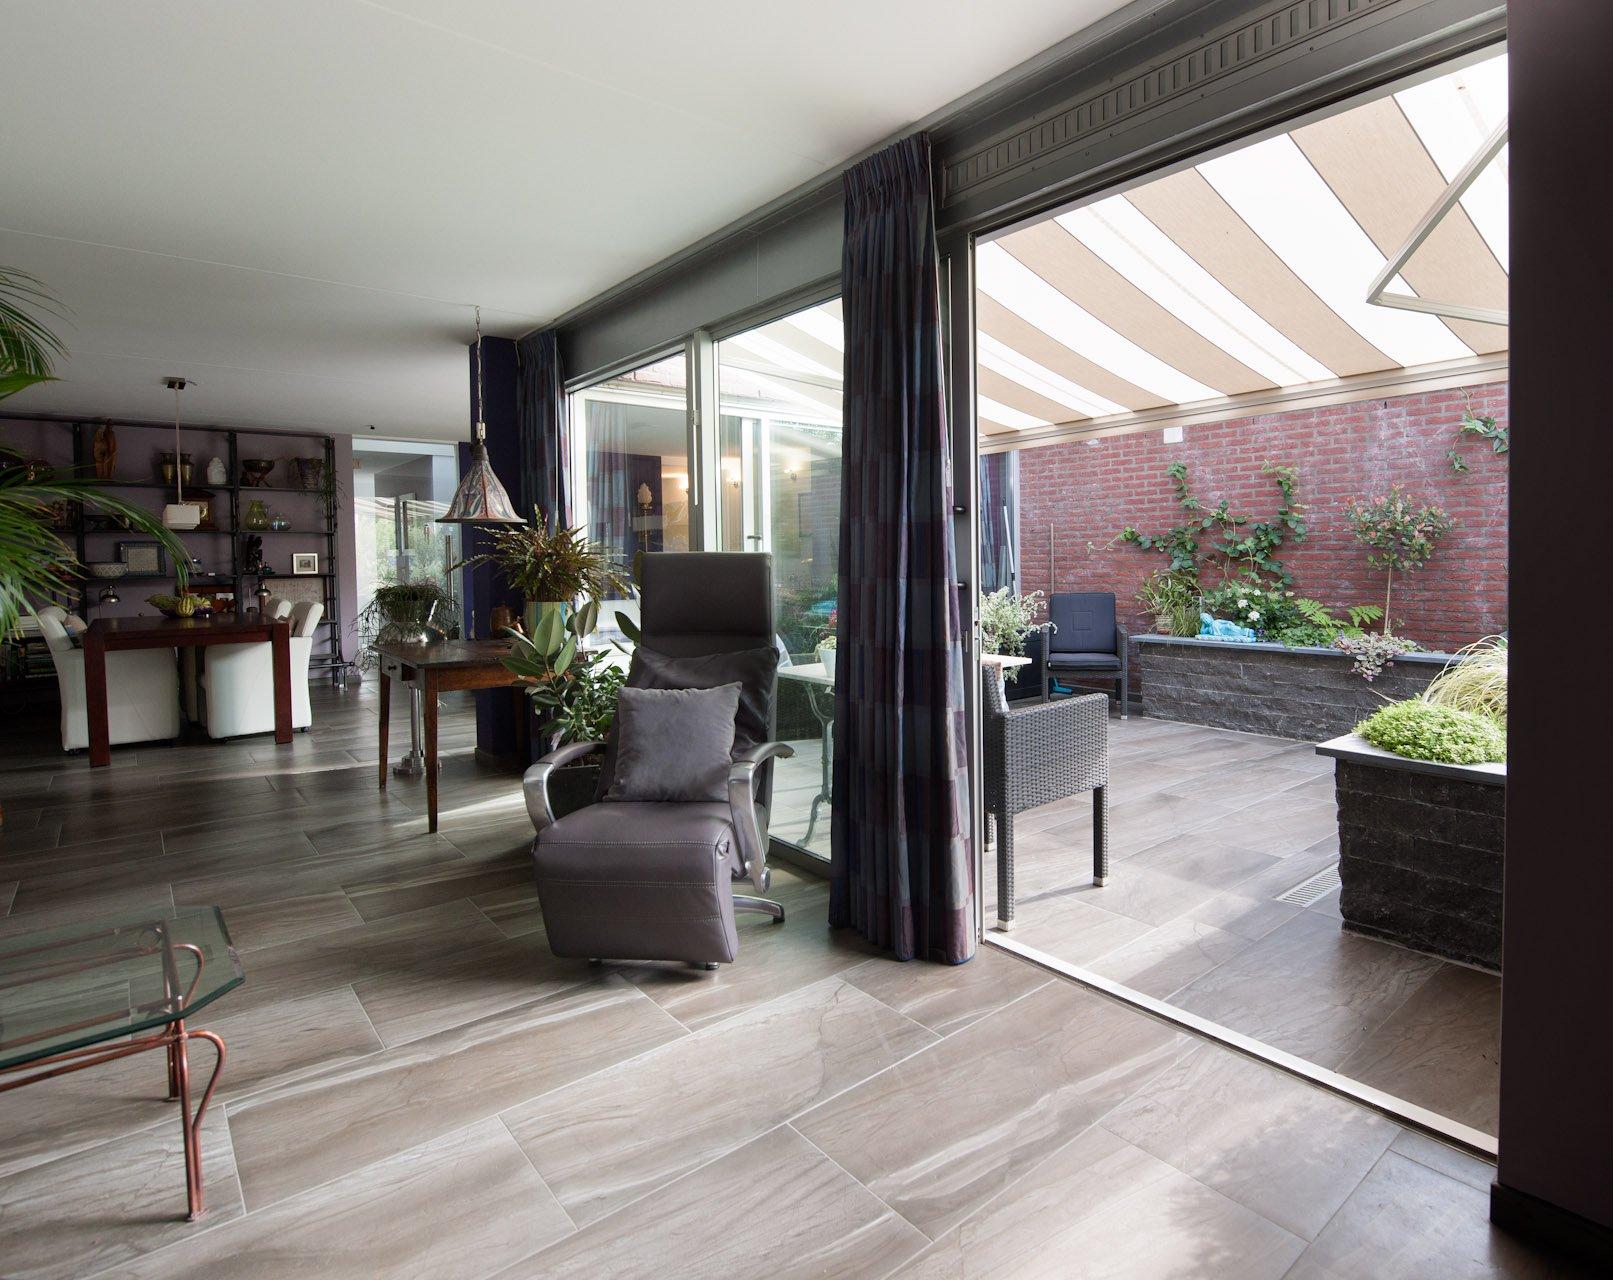 Vloertegels woonkamer - KROON vloeren in Steen